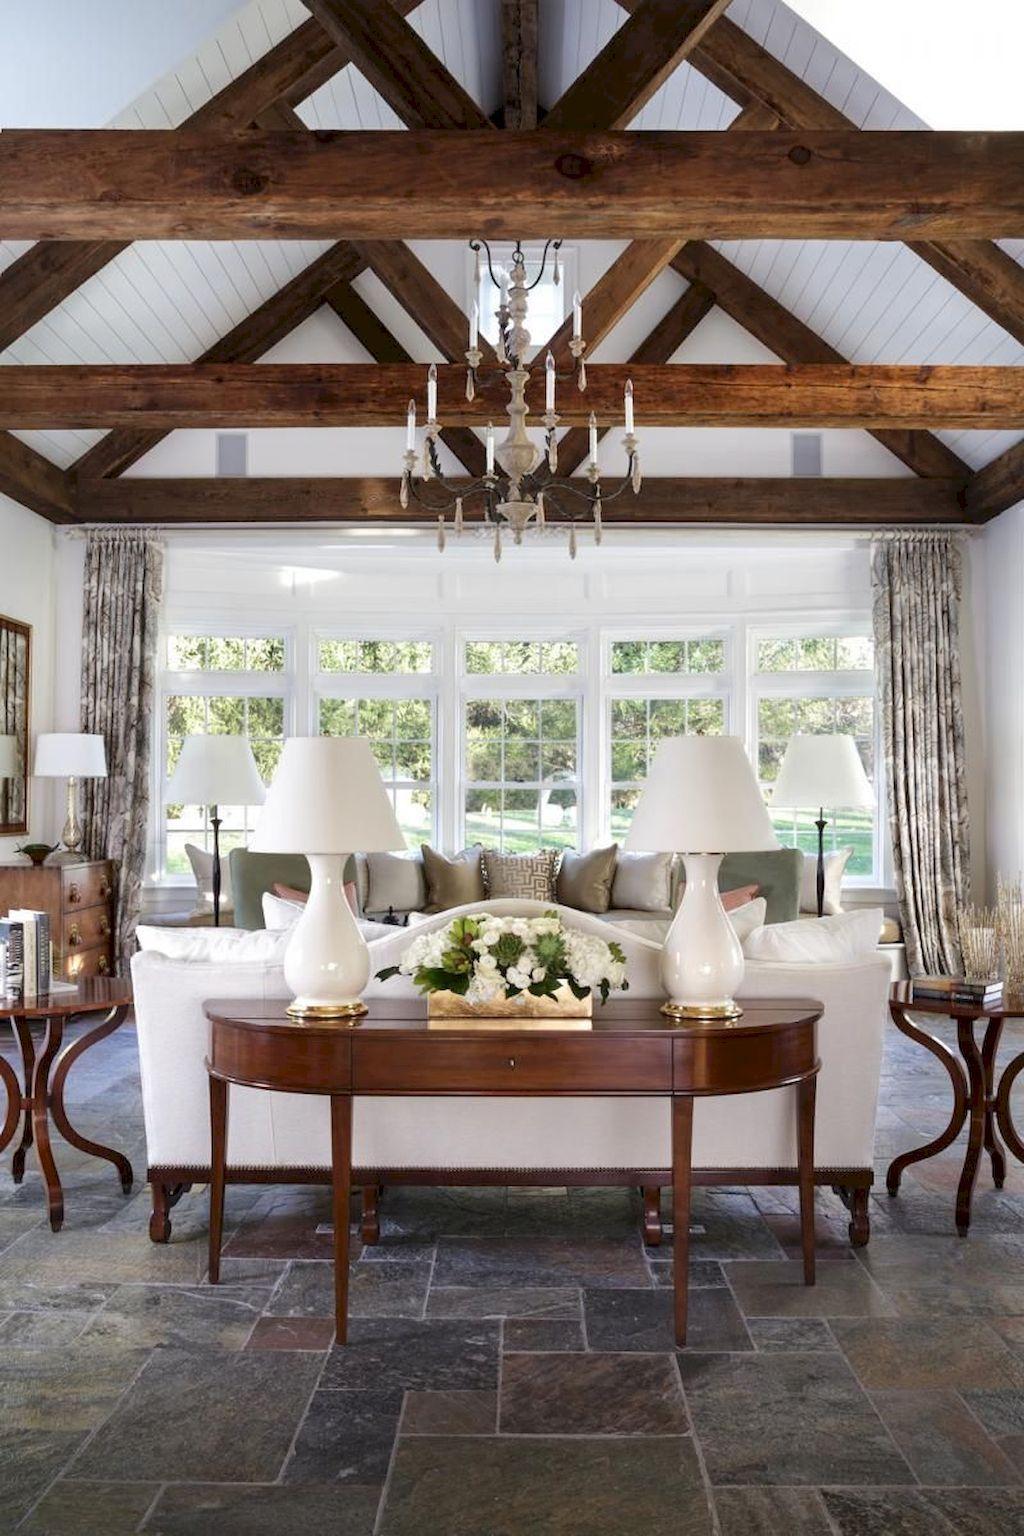 Wooden Furniture Living Room Designs: 42 Cozy Modern Farmhouse Living Room Decor Ideas